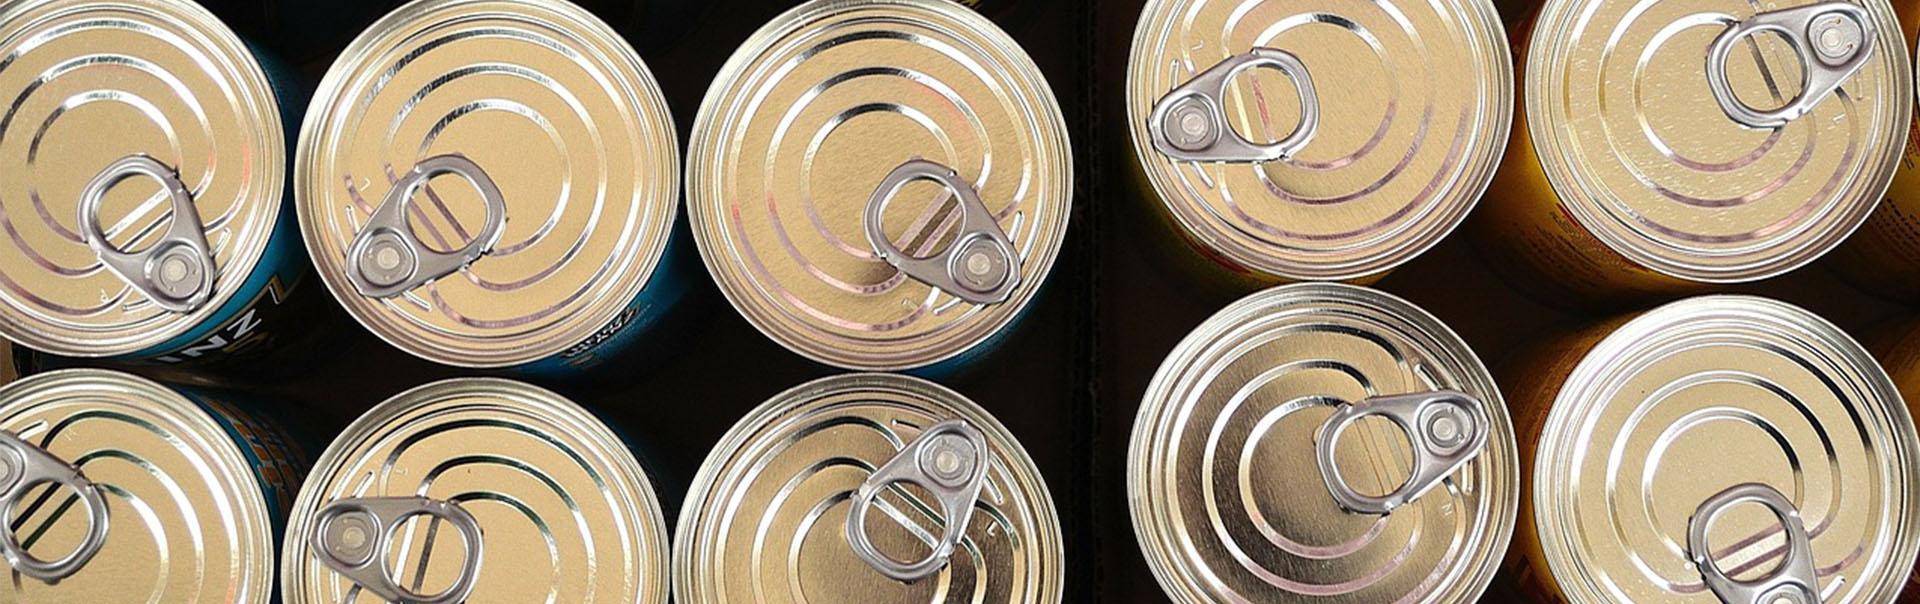 Cupboard ingredients canned measurements